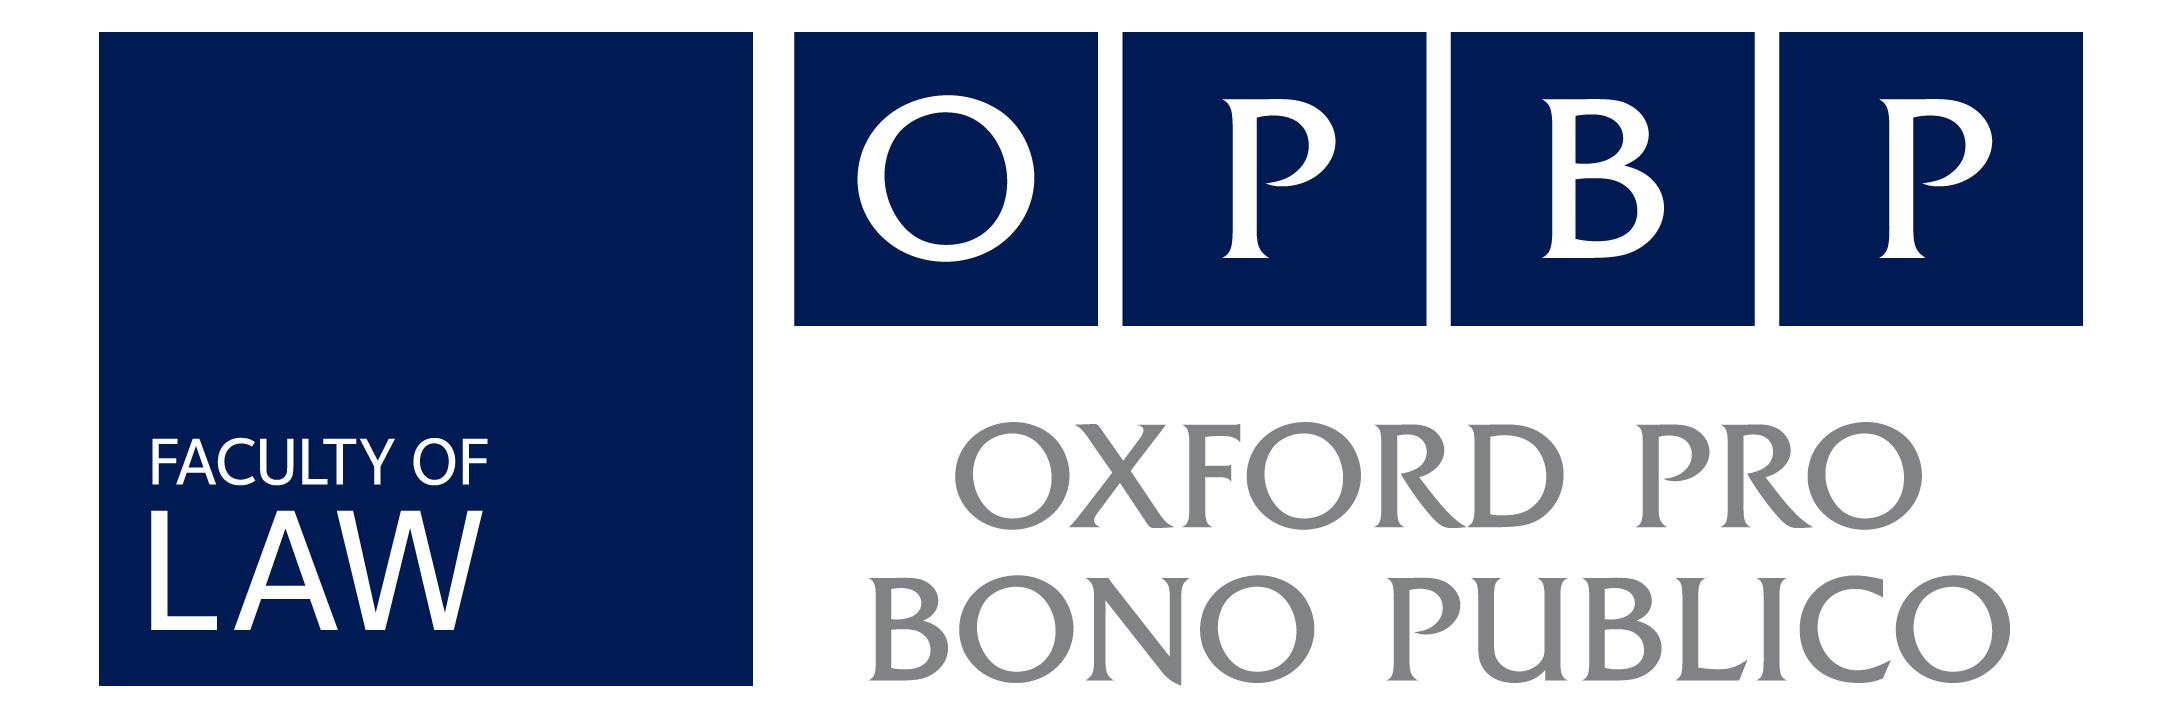 New Oxford Pro Bono Publico Executive Committee 2015-2016